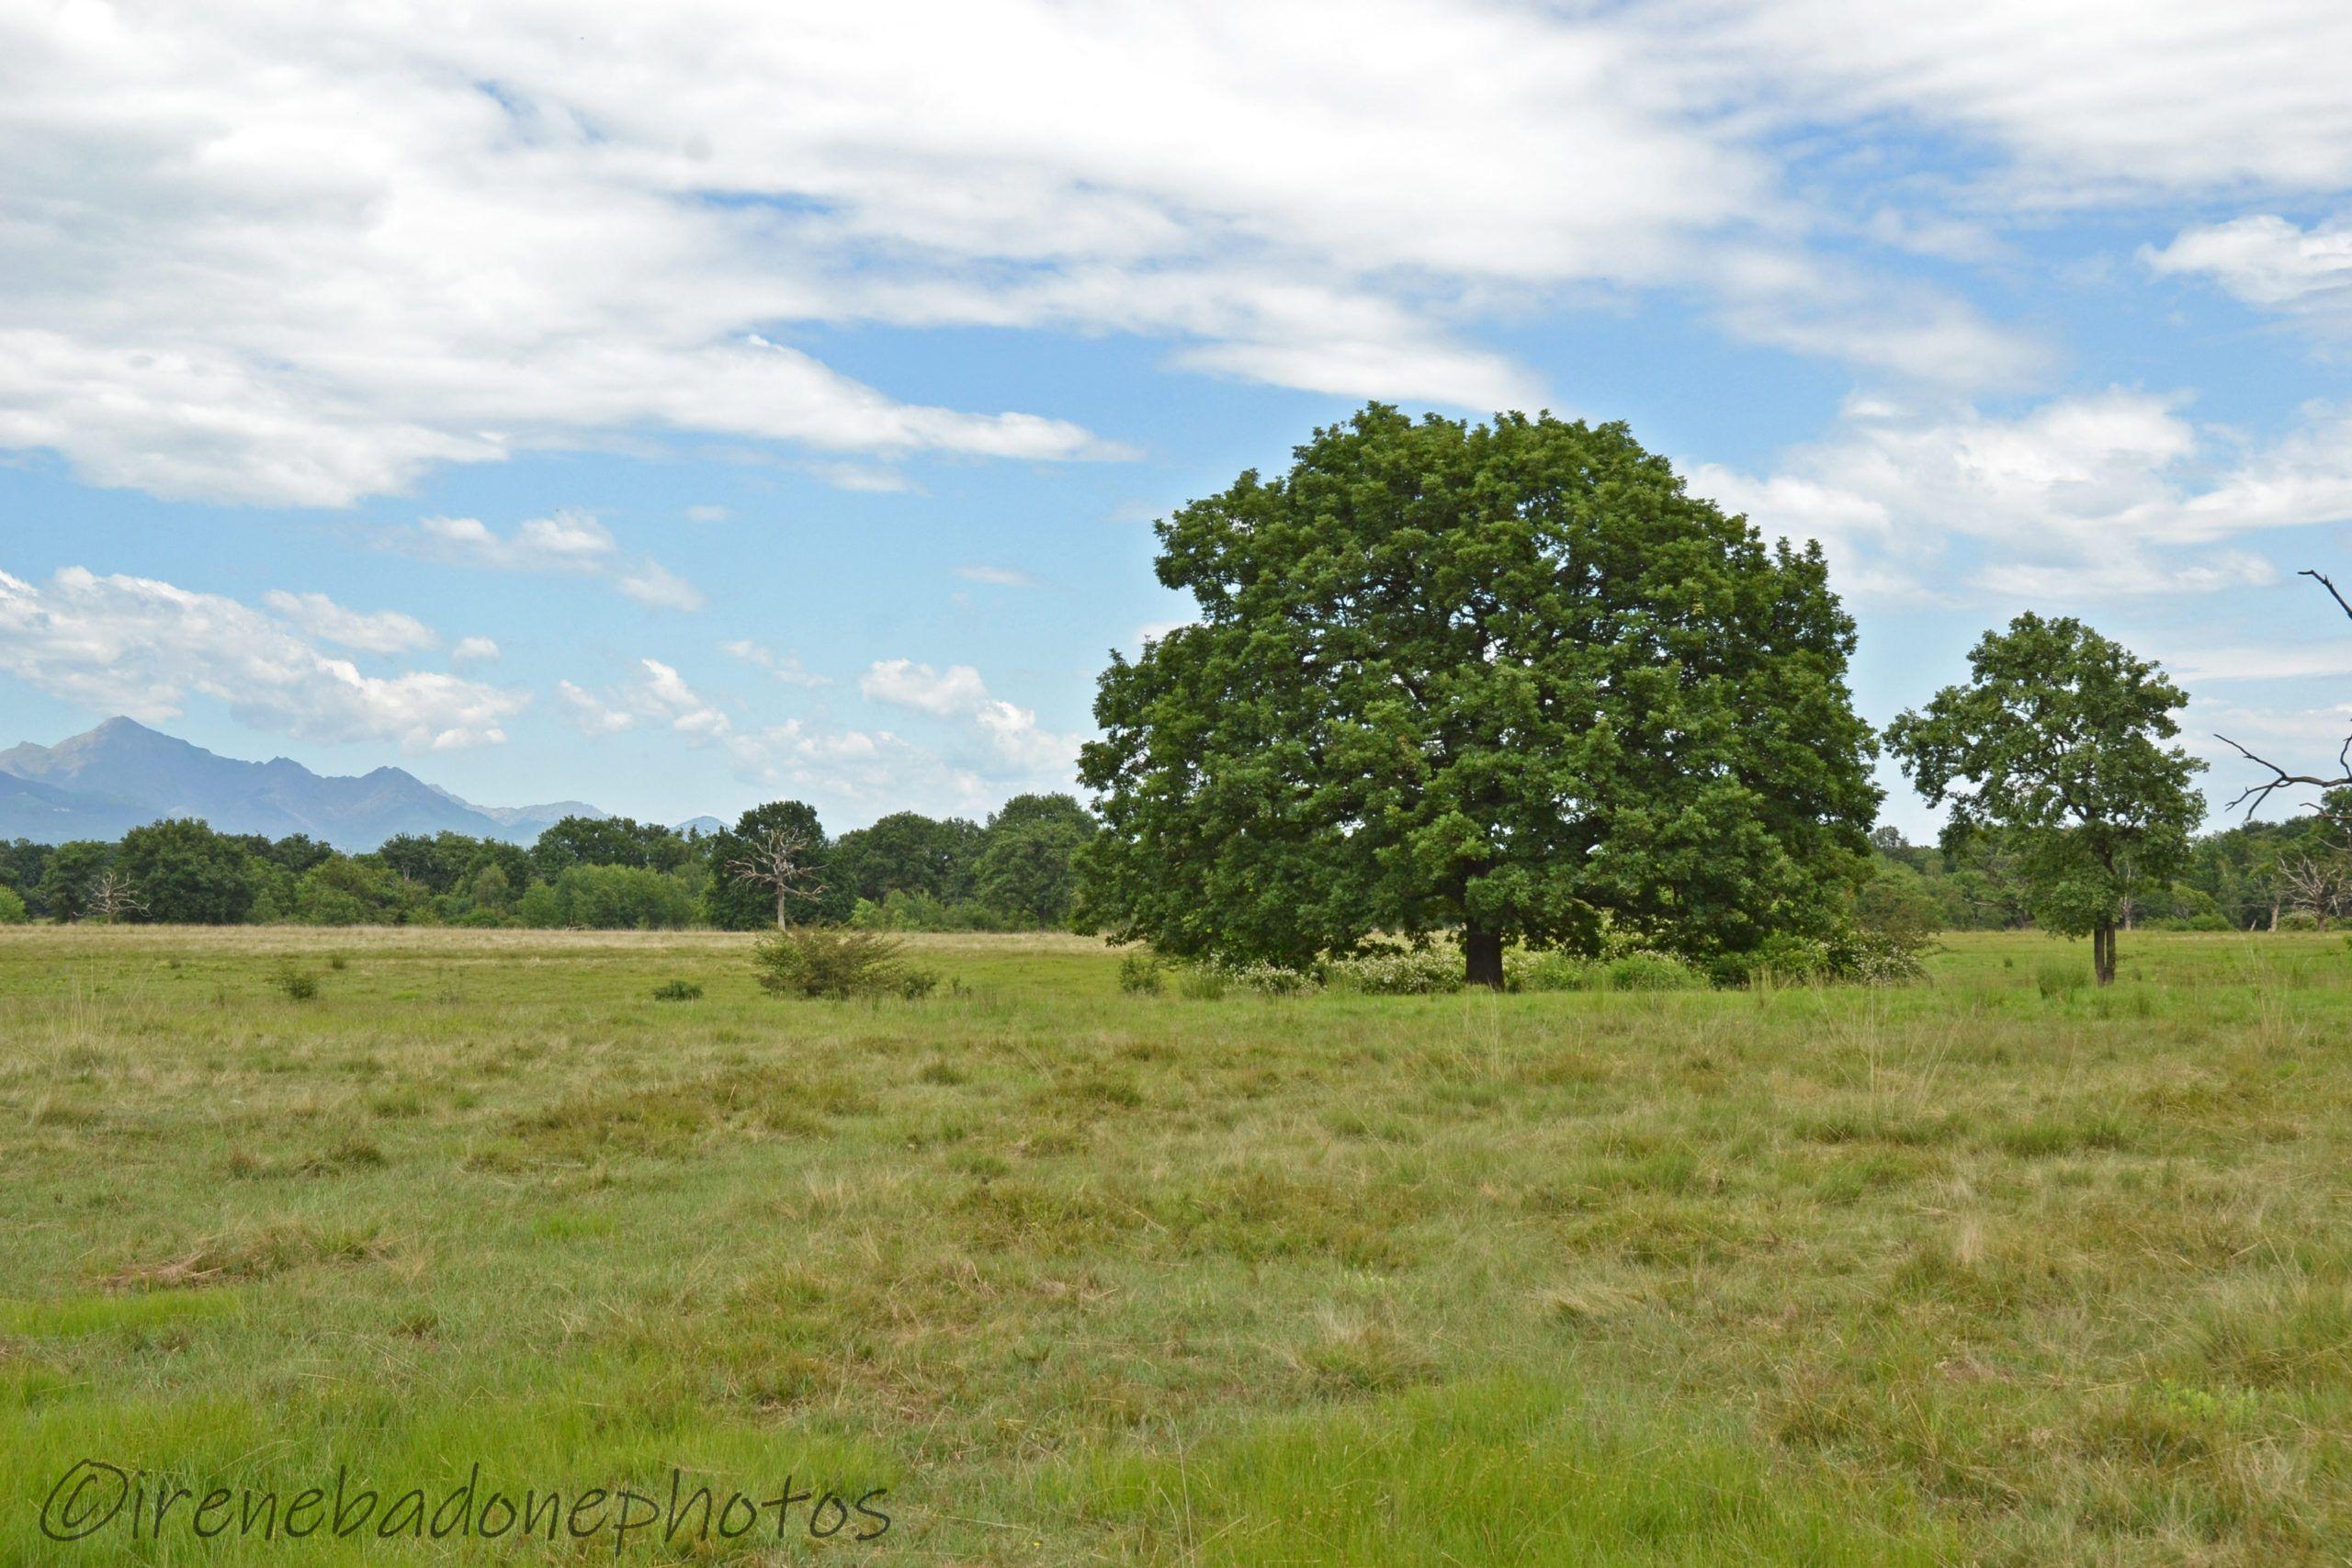 Il parco vanta la presenza di enormi querce centenarie